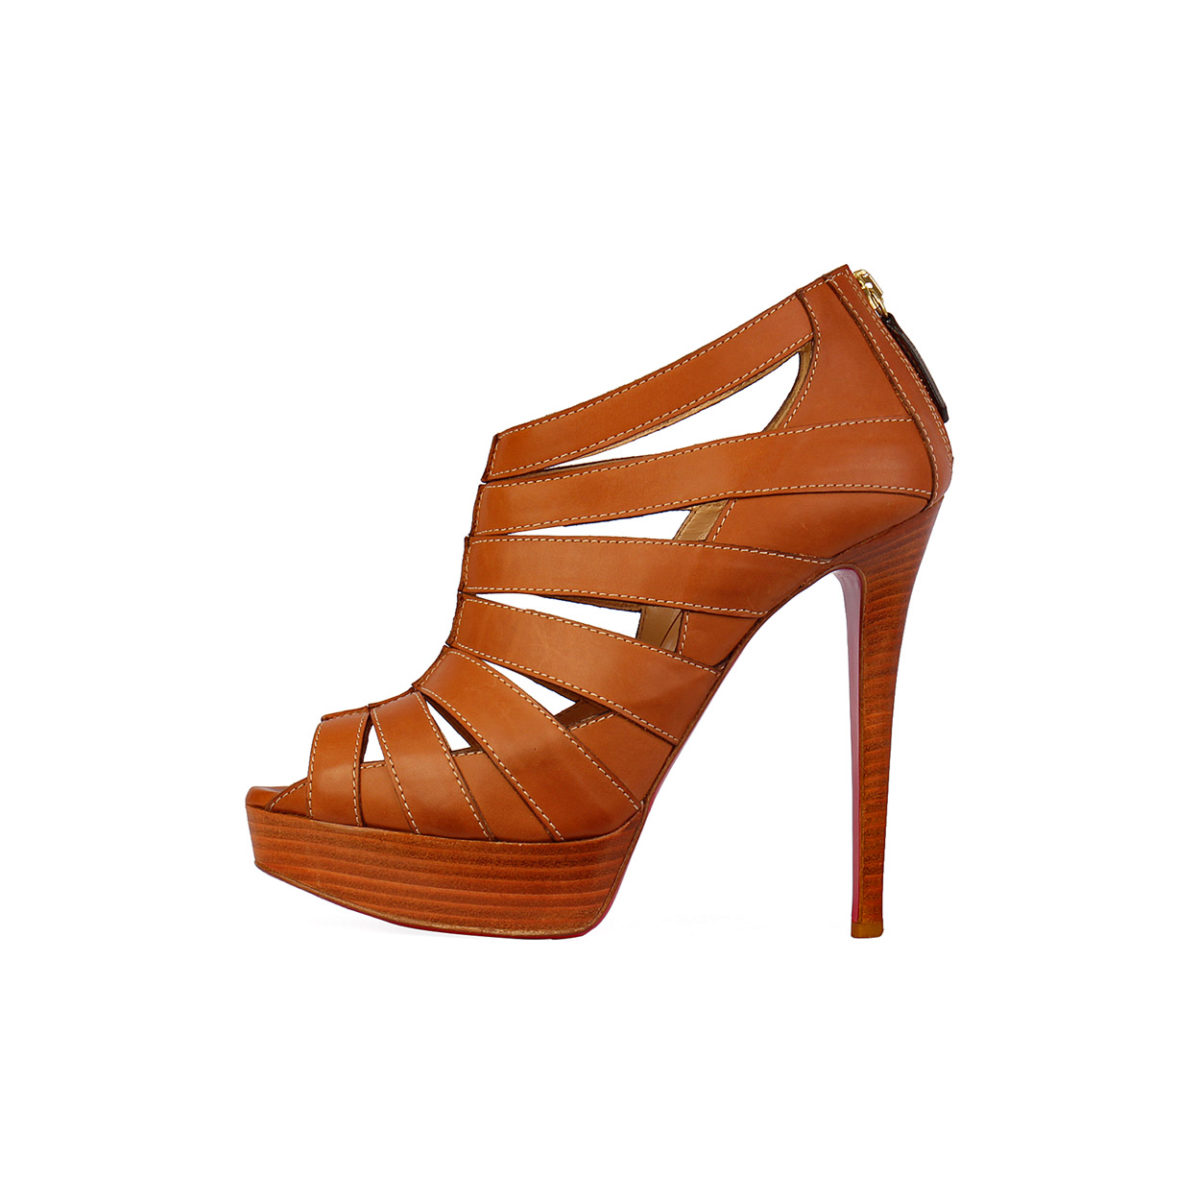 1325f026f7a CHRISTIAN LOUBOUTIN Pique Cire 140 Platform Heels – S  40 (6.5)